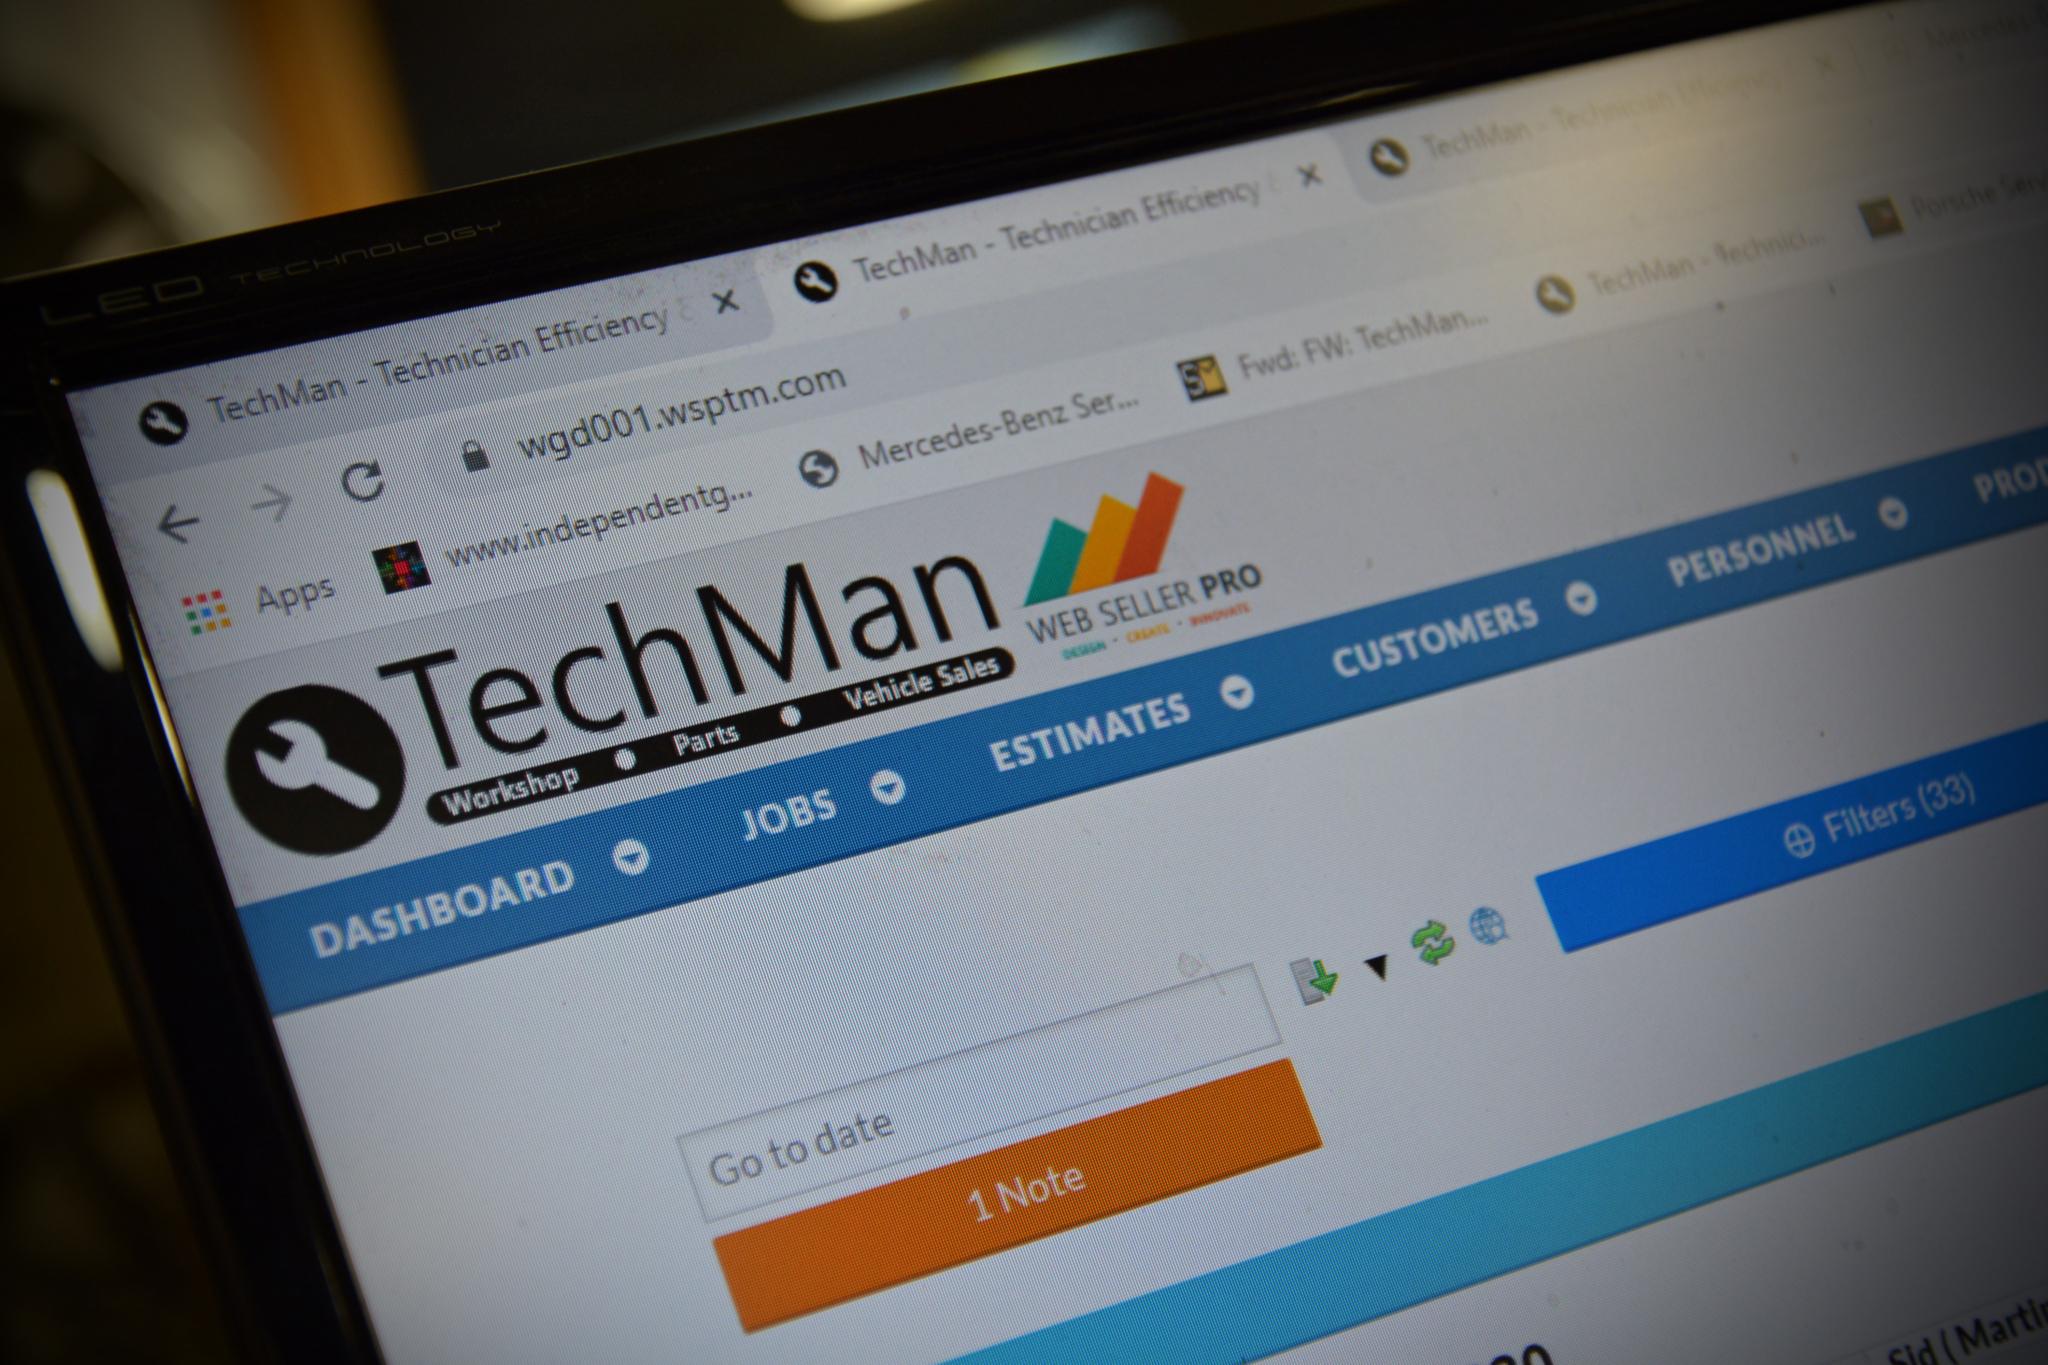 New TechMan website reflects Garage Management System development